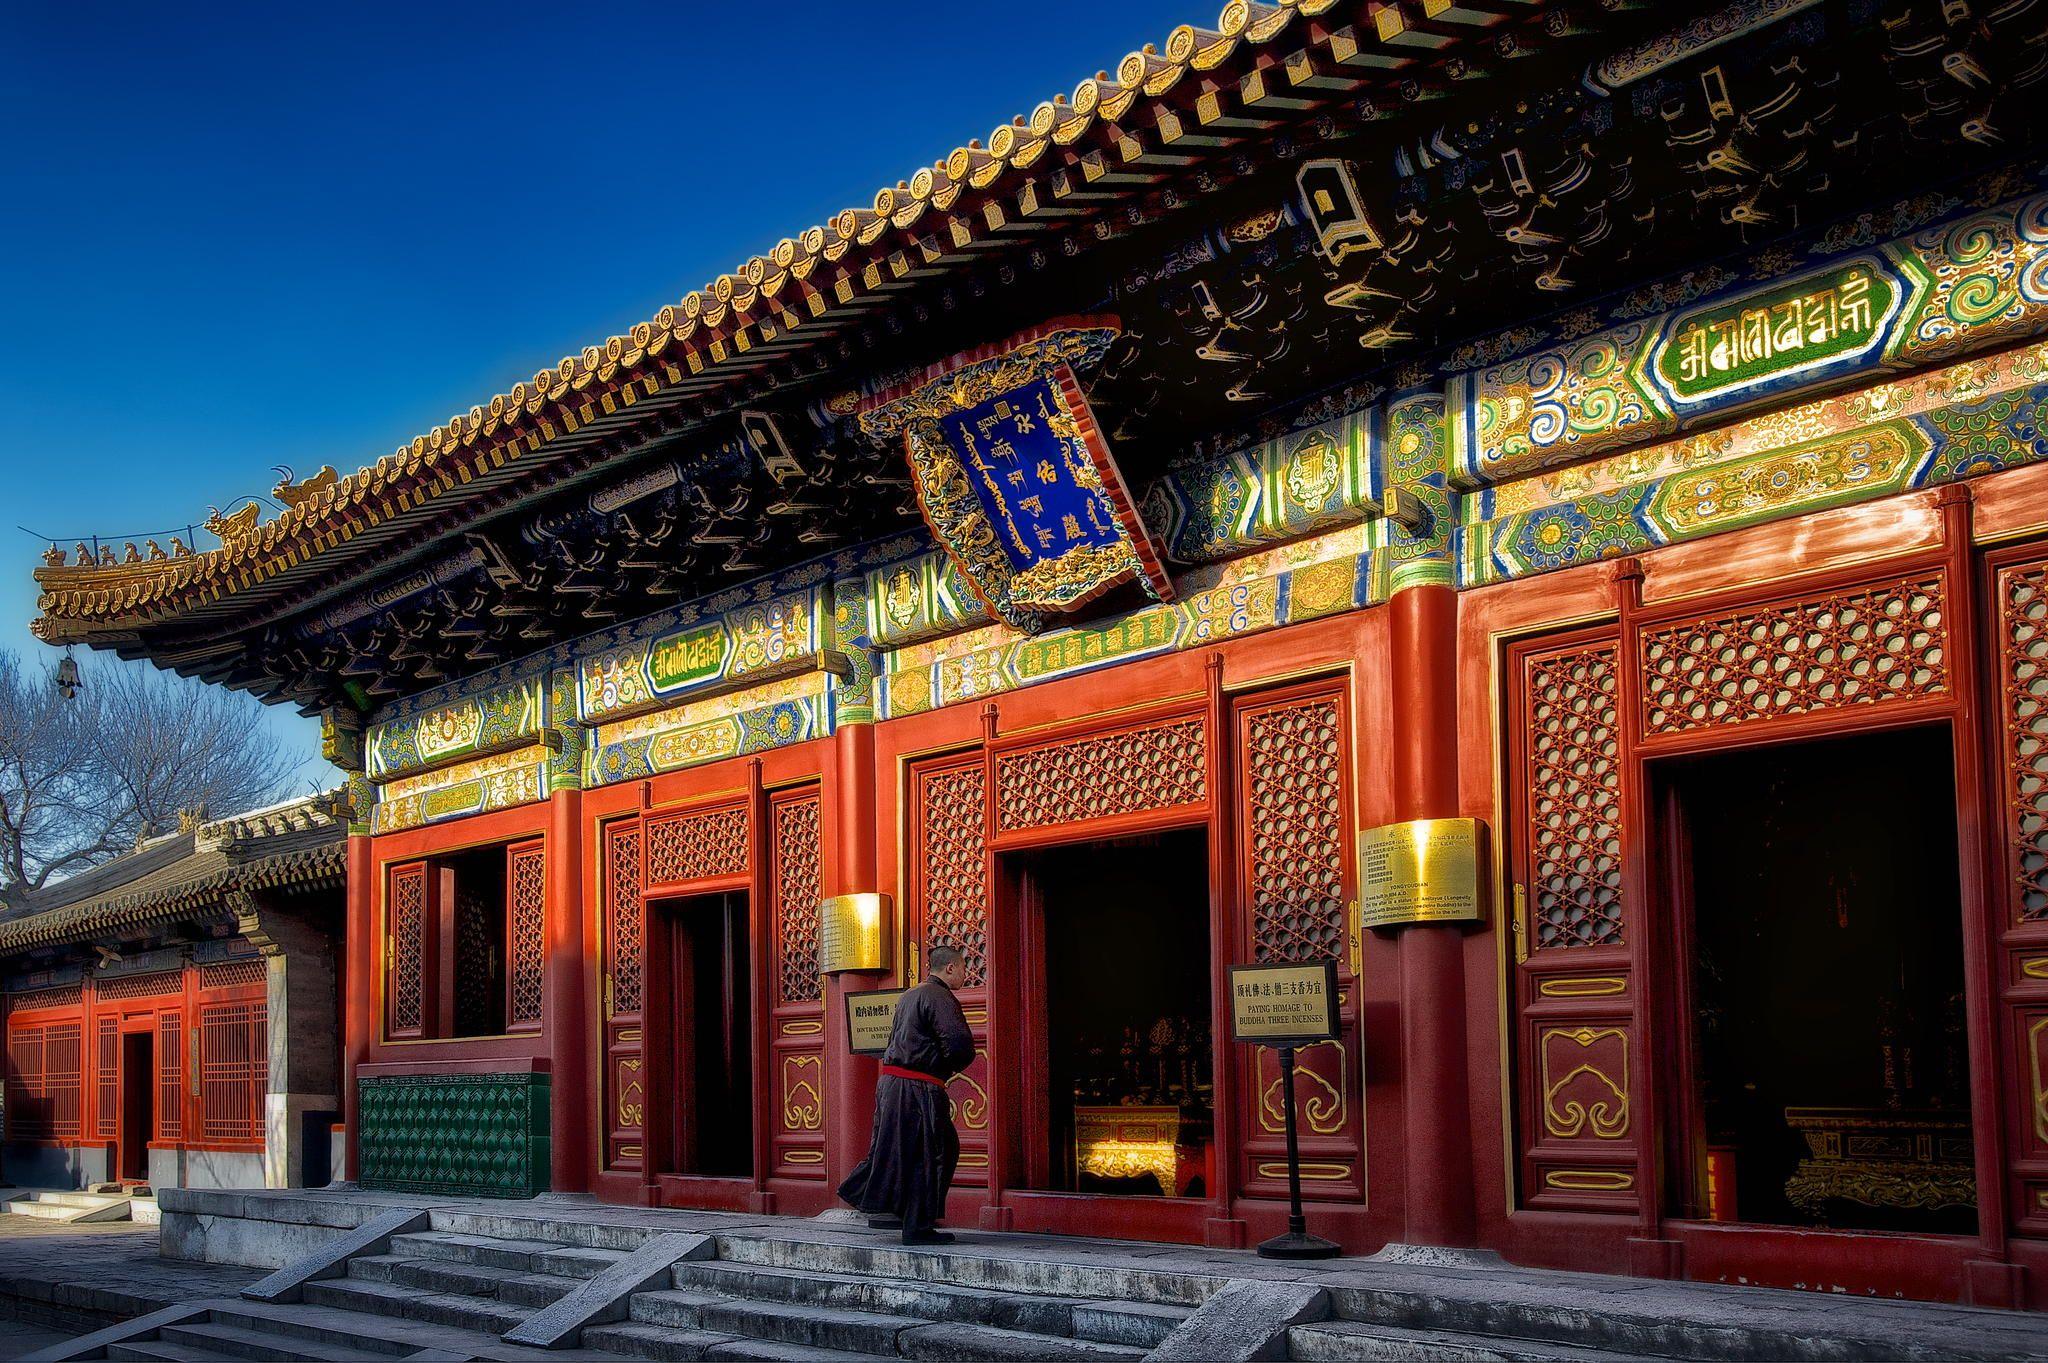 Картинки по запросу lama temple beijing site:pinterest.com